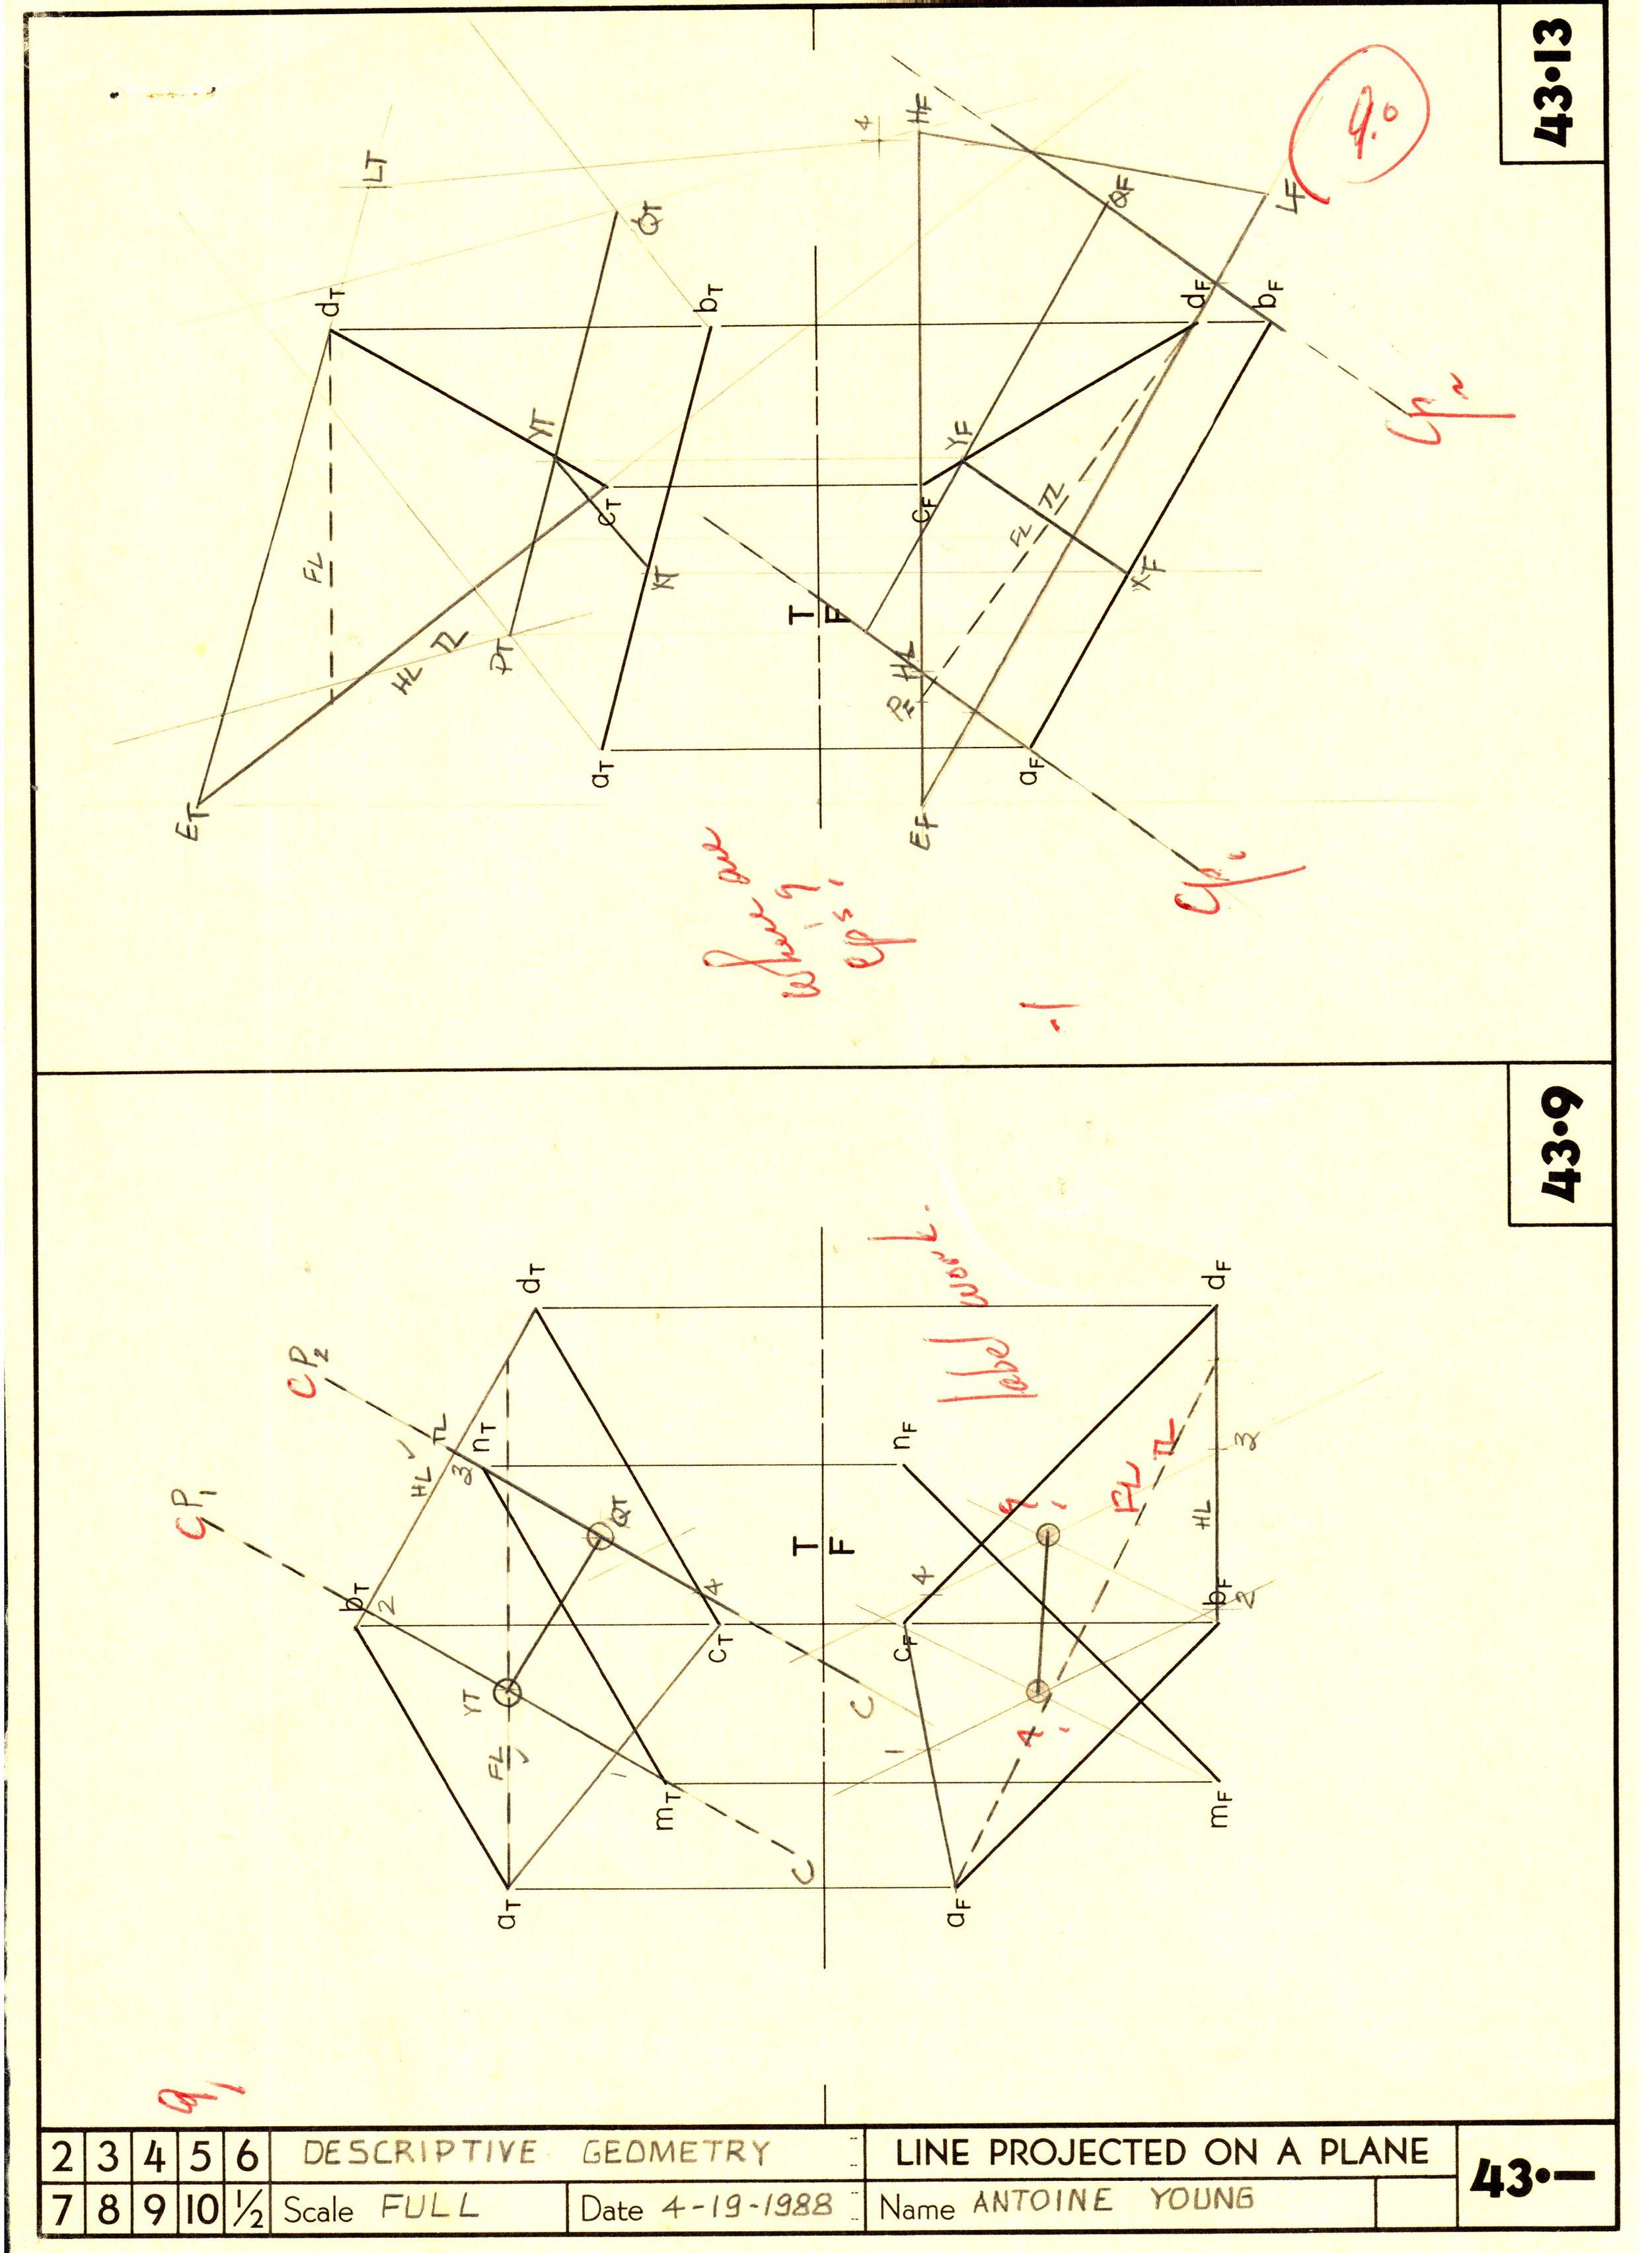 Geometric Tolerance & Dimensioning 1